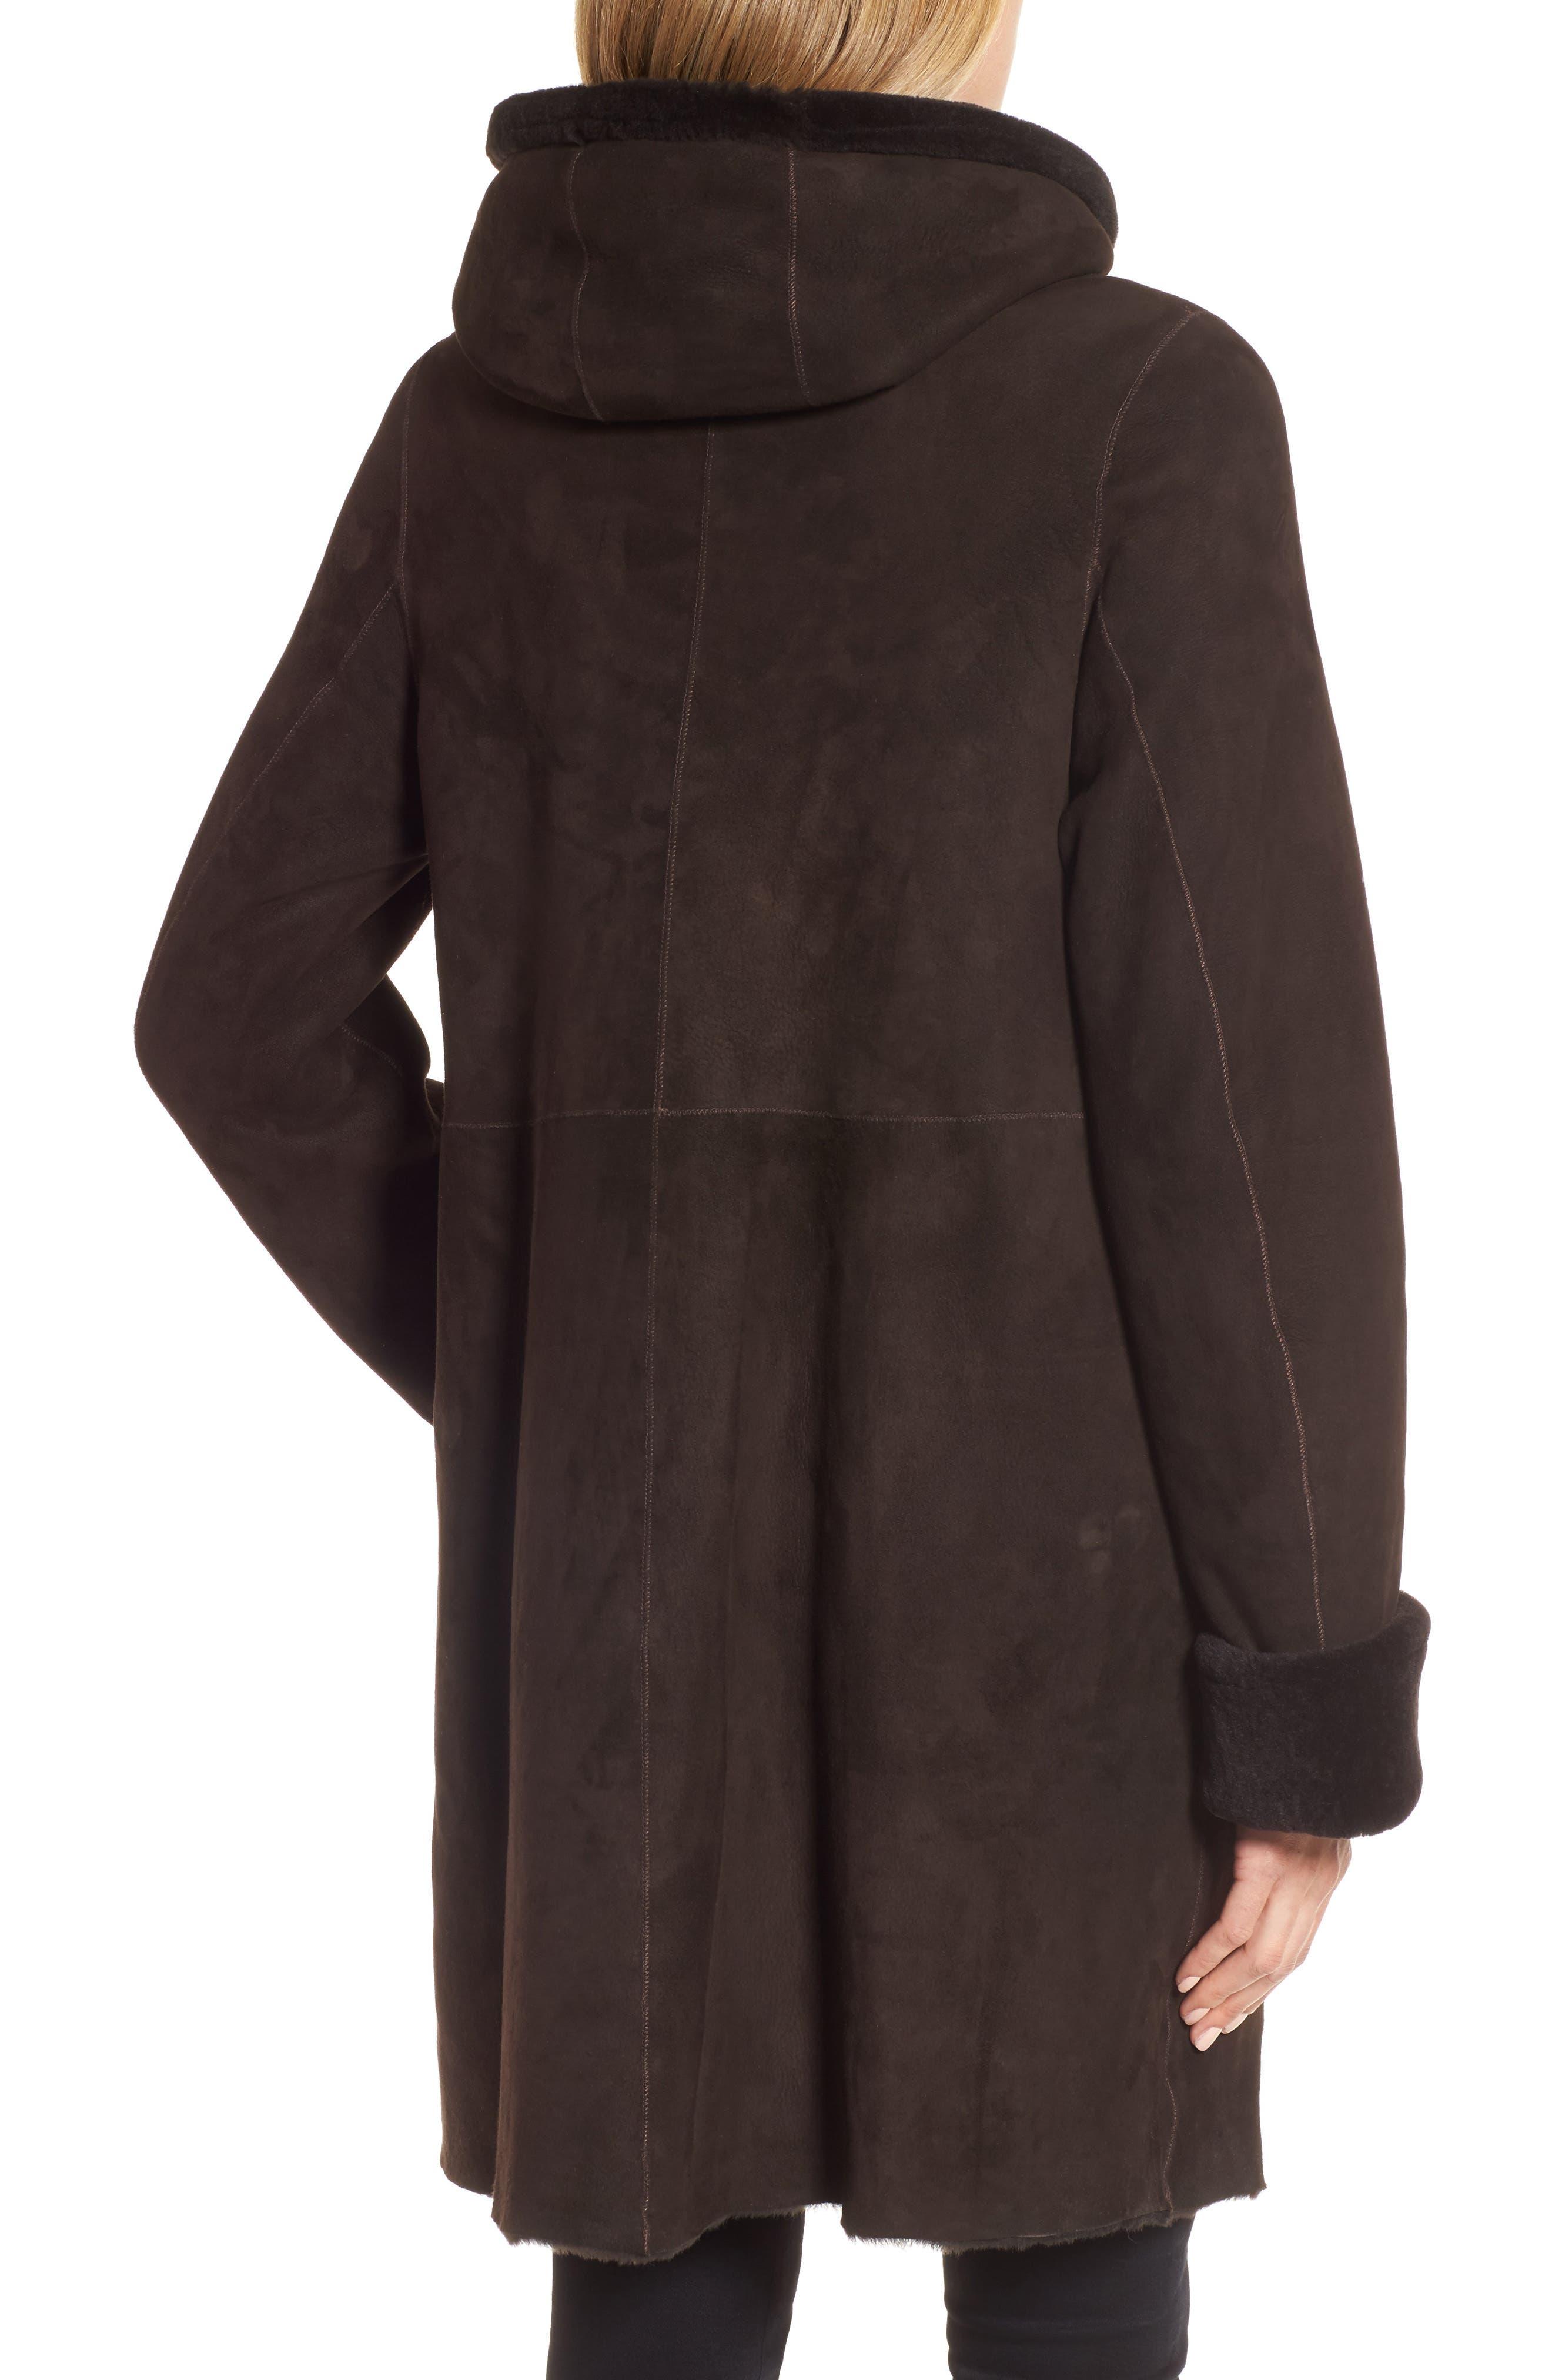 Hooded Genuine Shearling Coat,                             Alternate thumbnail 2, color,                             206